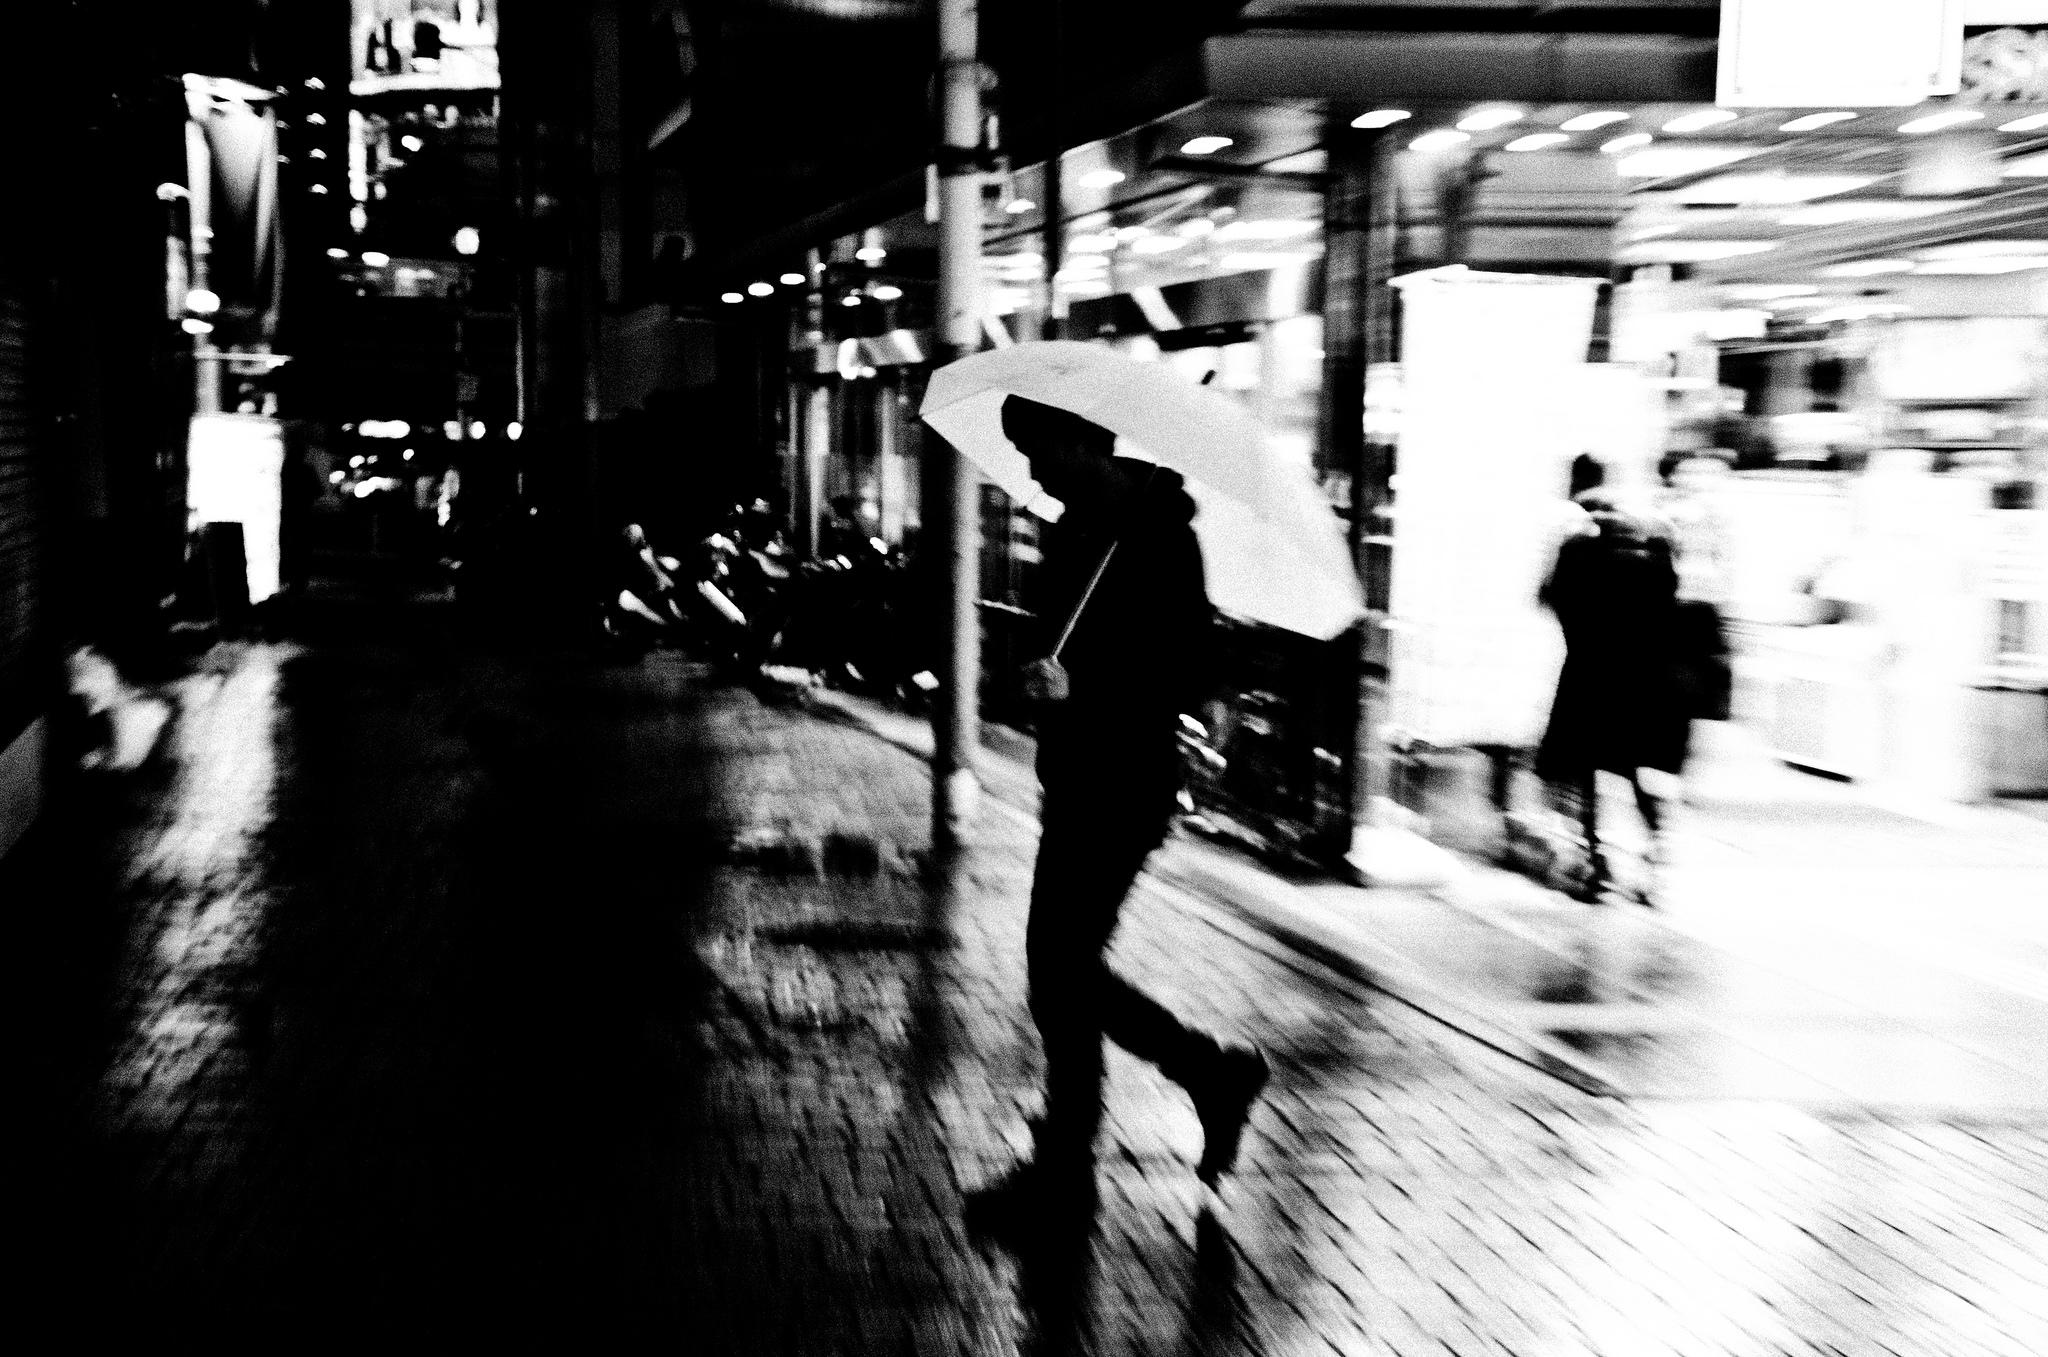 This Tokyo night